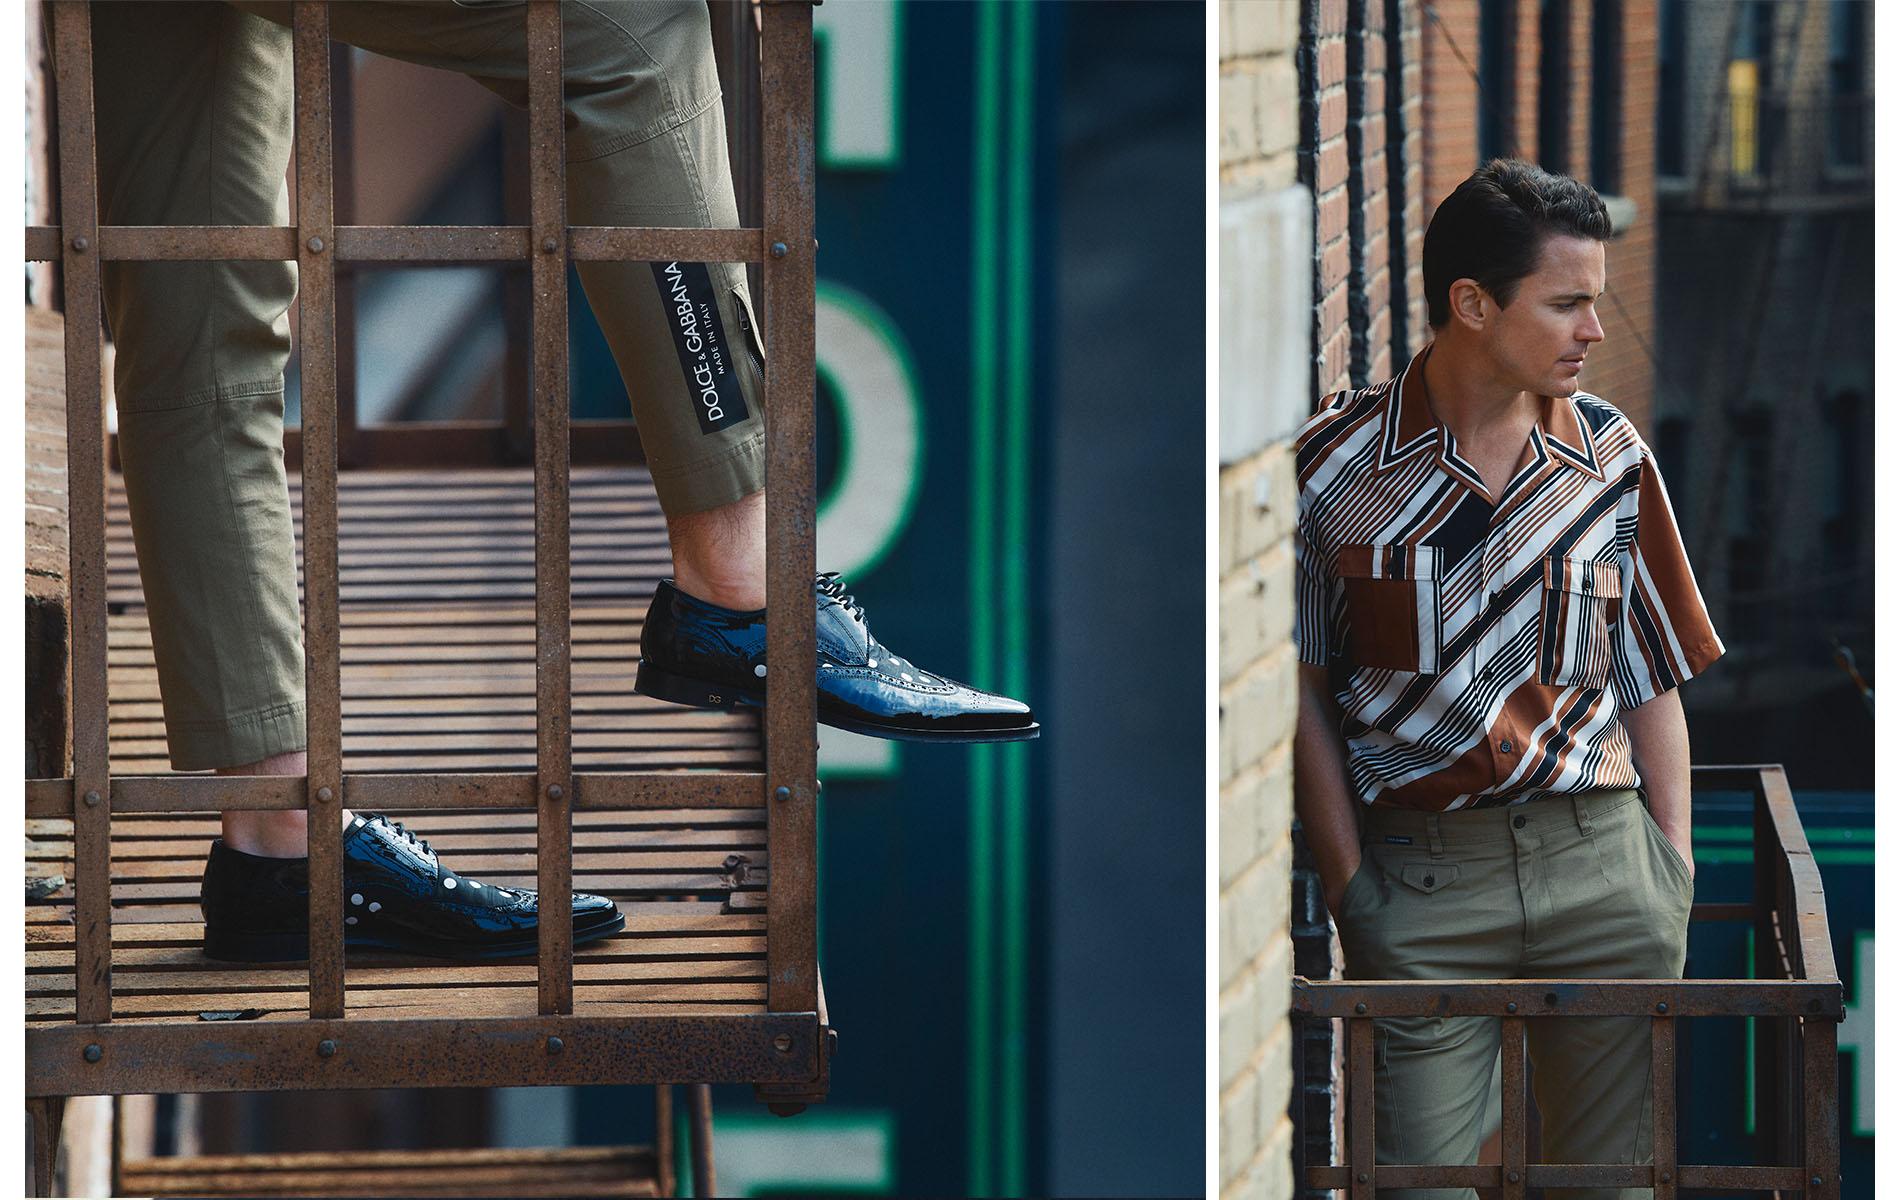 Matt Bomer Los Angeles Neiman Marcus Menswear Dolce & Gabbana Warner Brothers